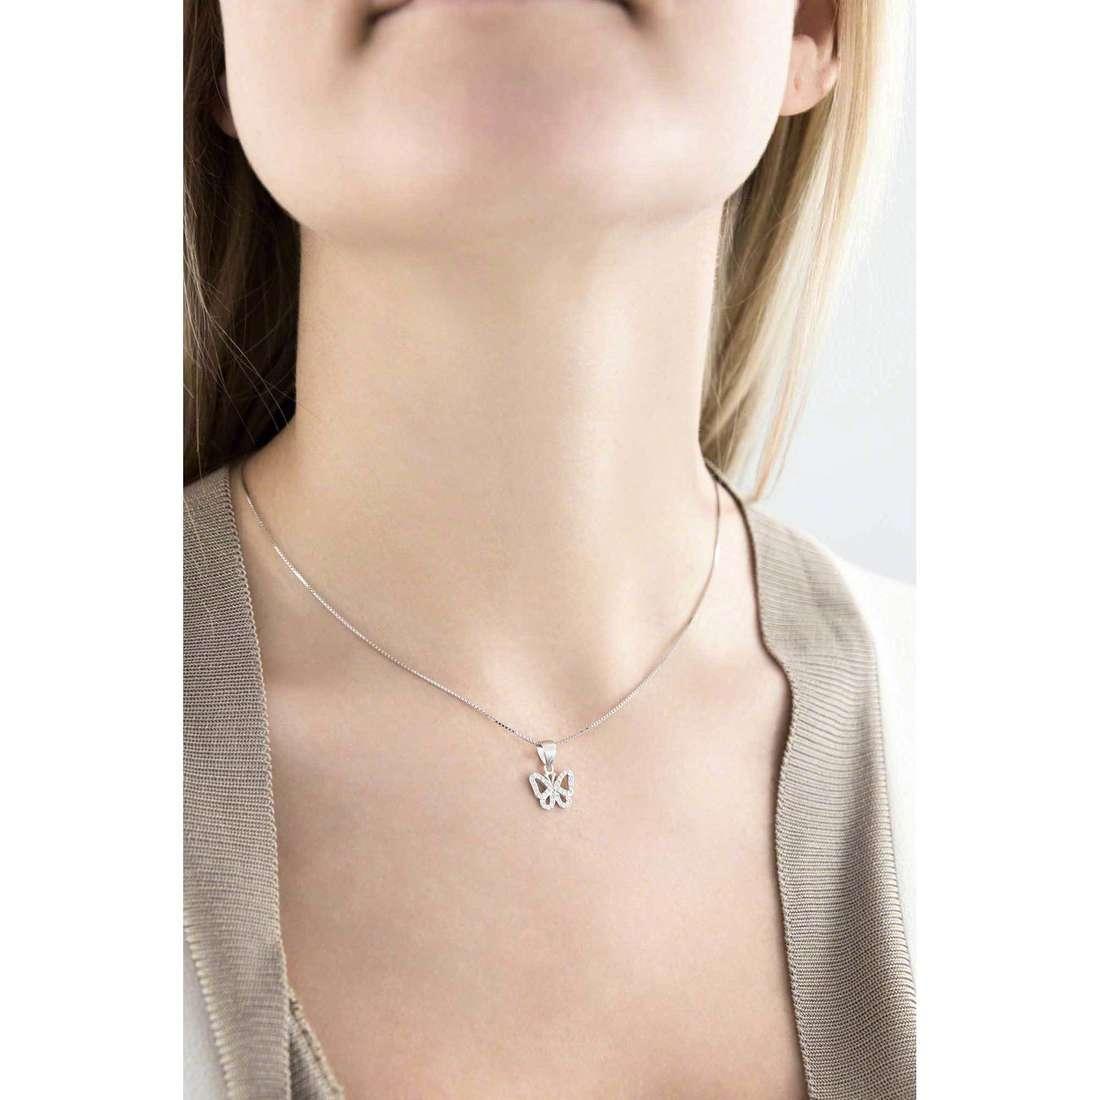 GioiaPura colliers femme 36657-01-00 indosso